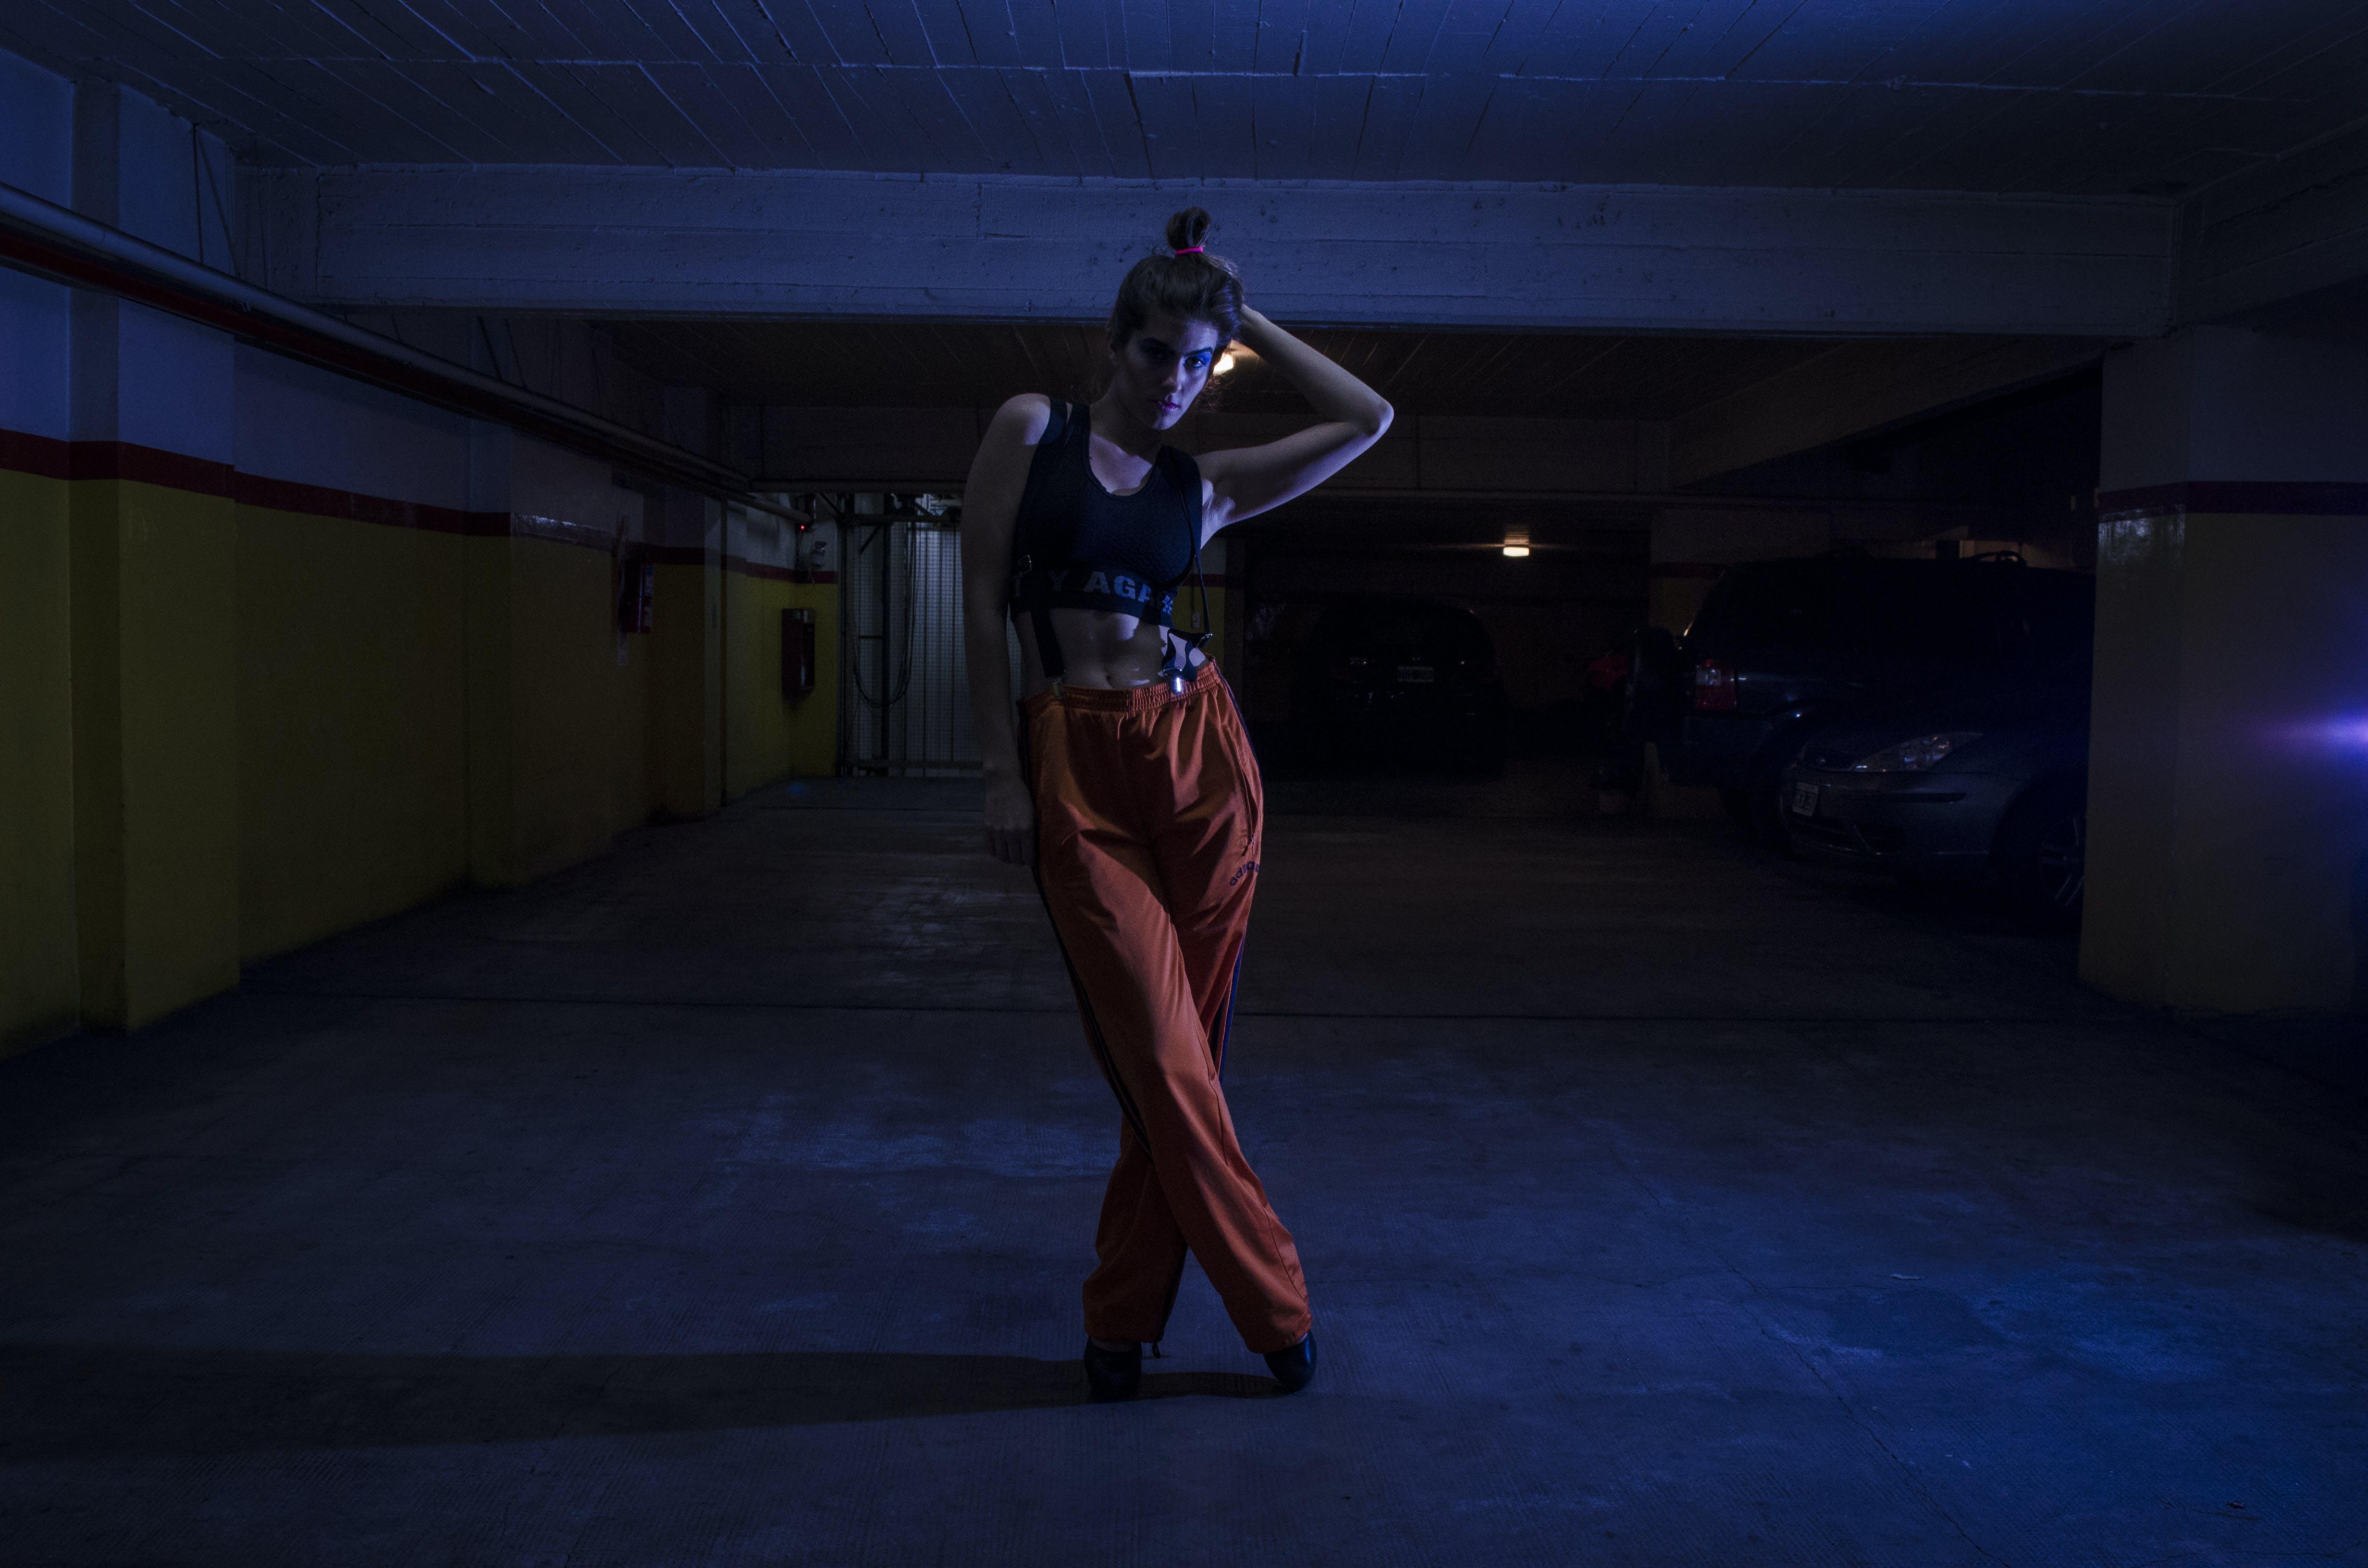 Woman Wearing Black Crop-top and Orange Pants Inside Parking Lot